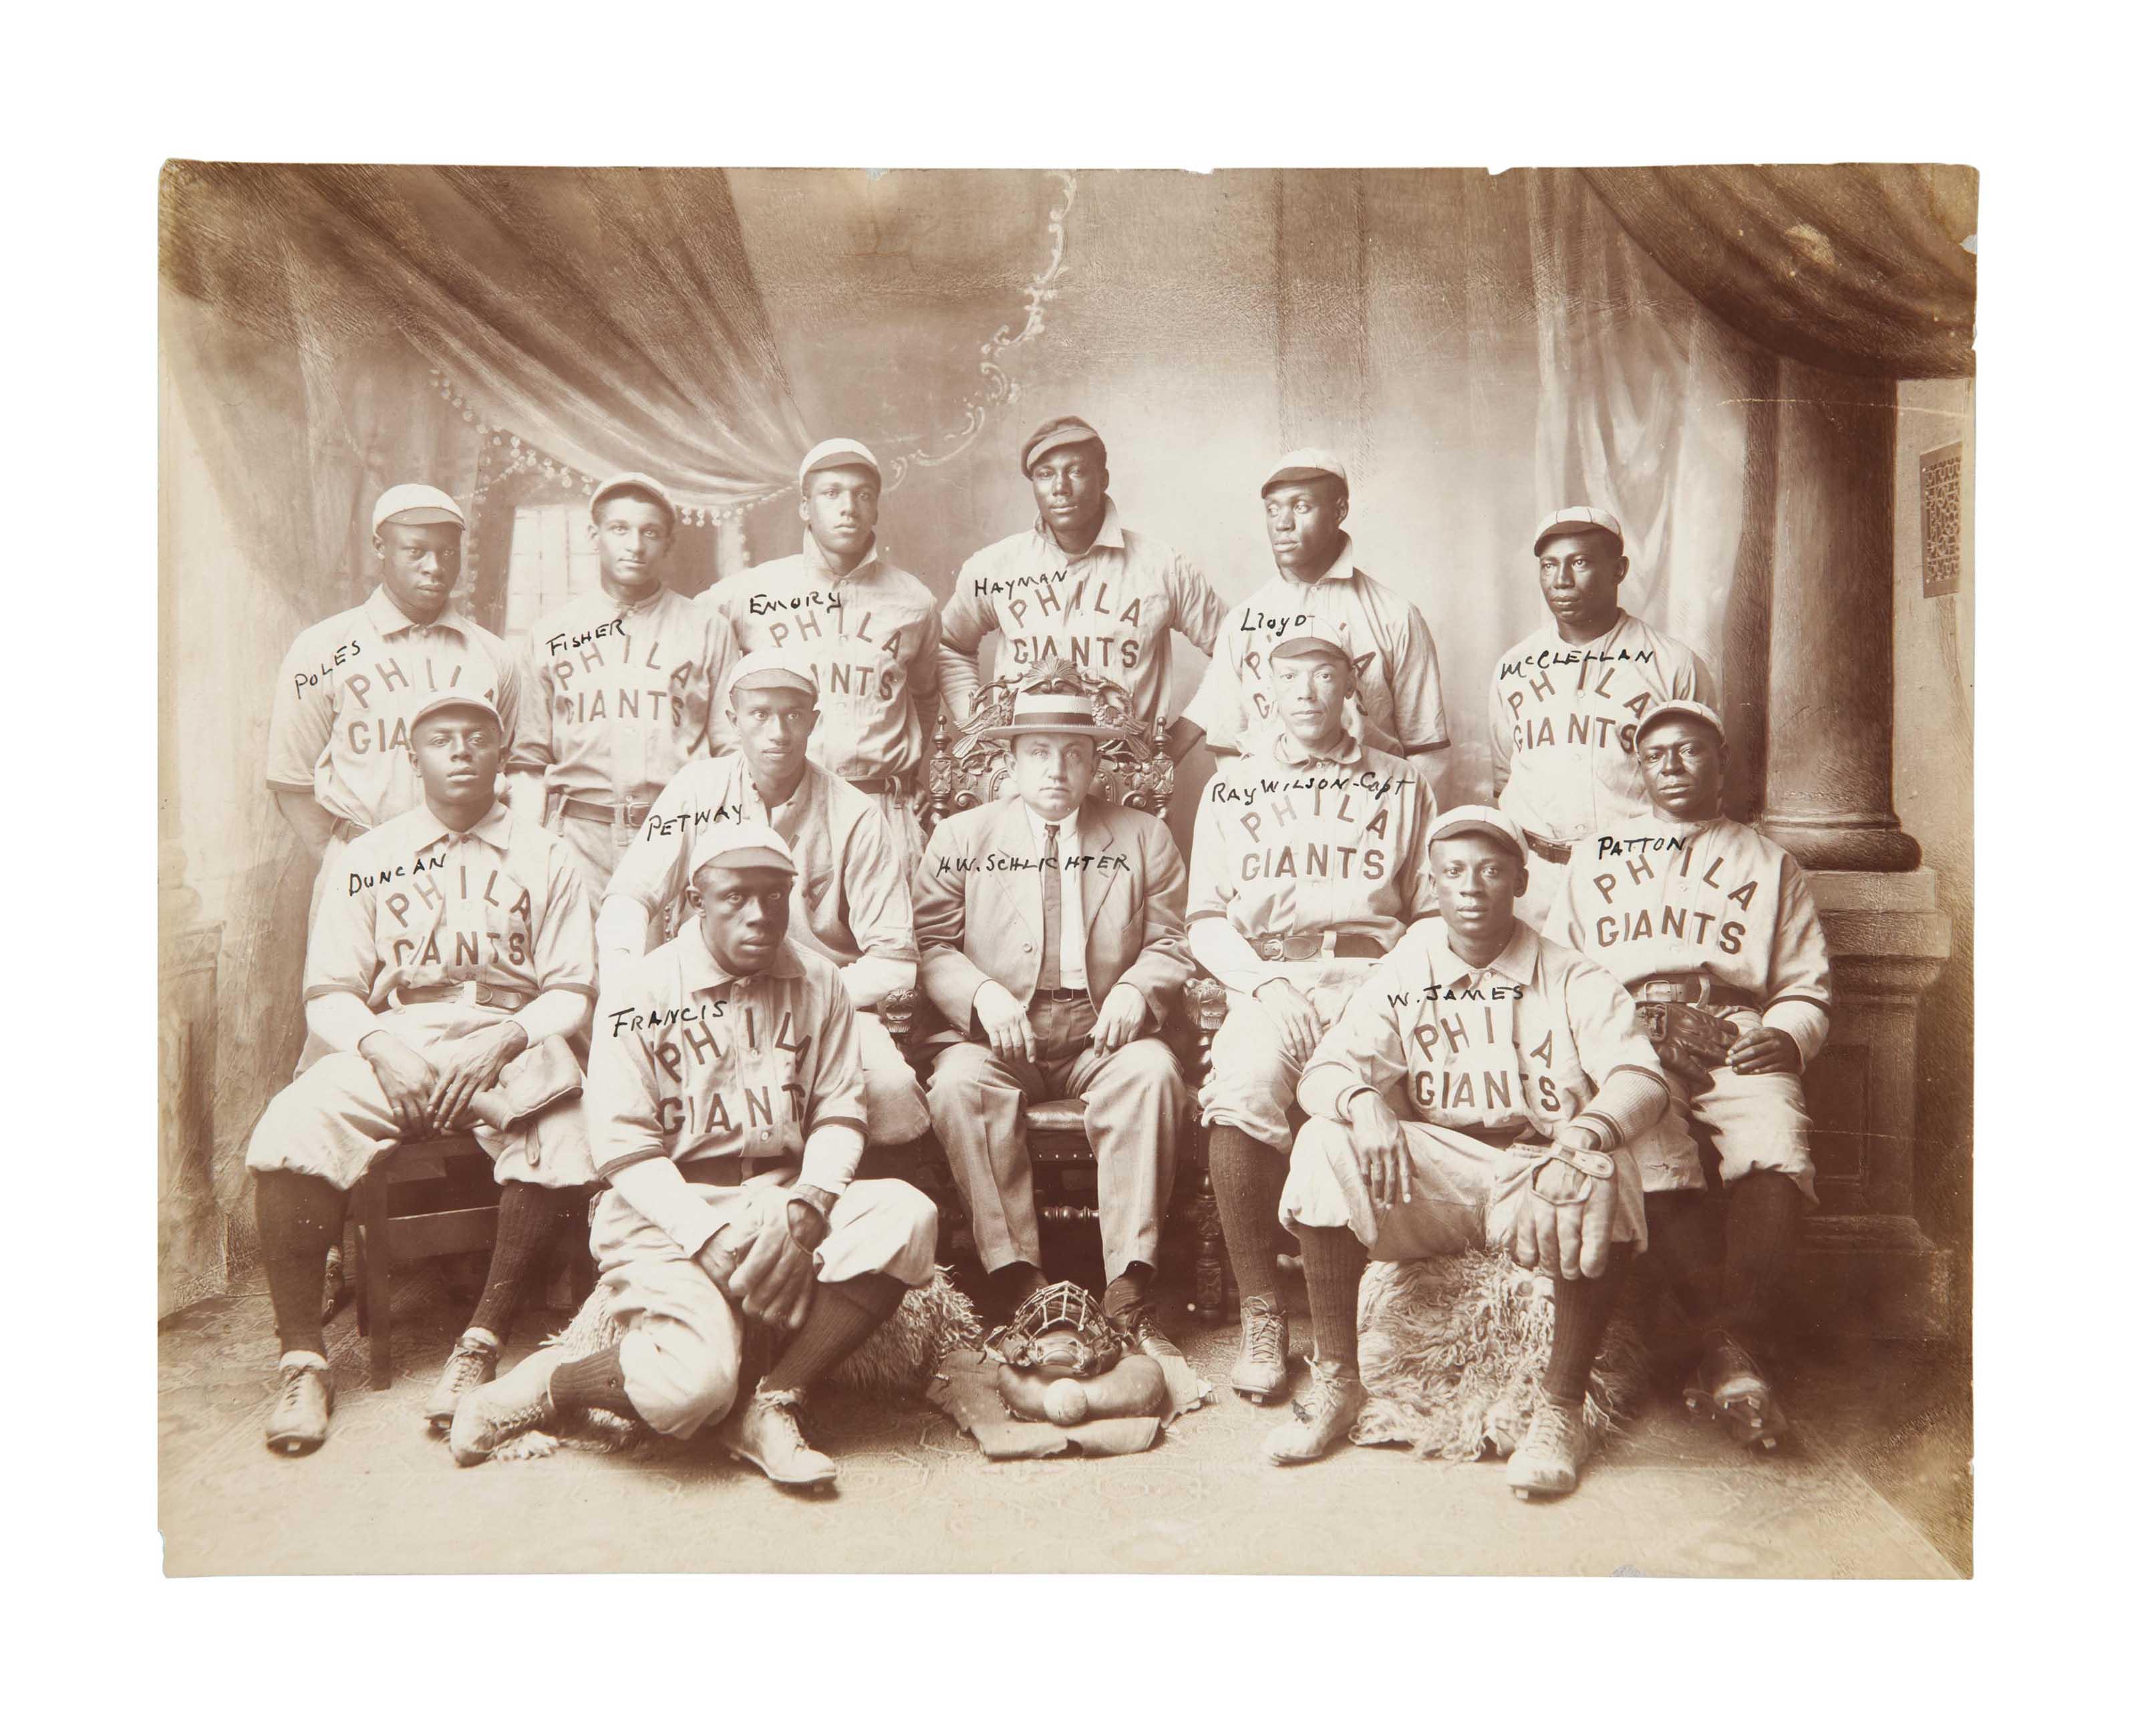 1909 PHILADELPHIA GIANTS TEAM